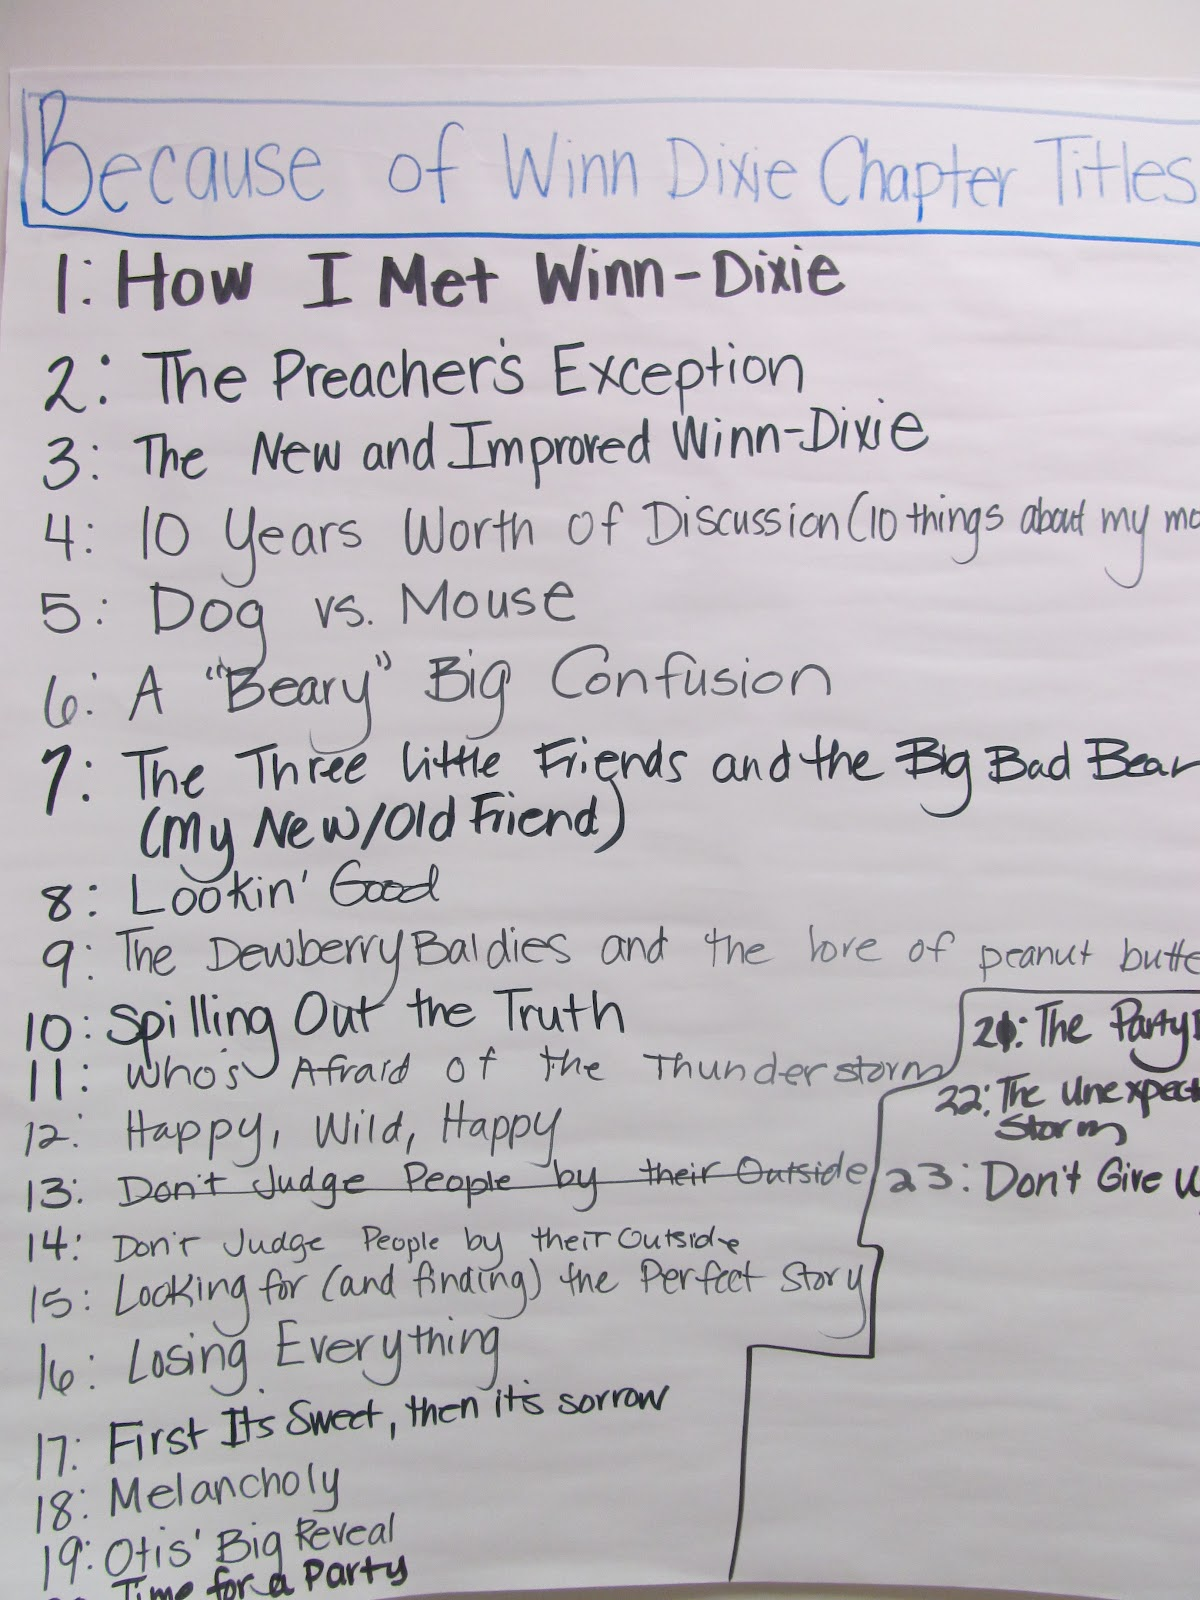 Mrs. Montanou0026#39;s Blog: Because of Winn Dixie